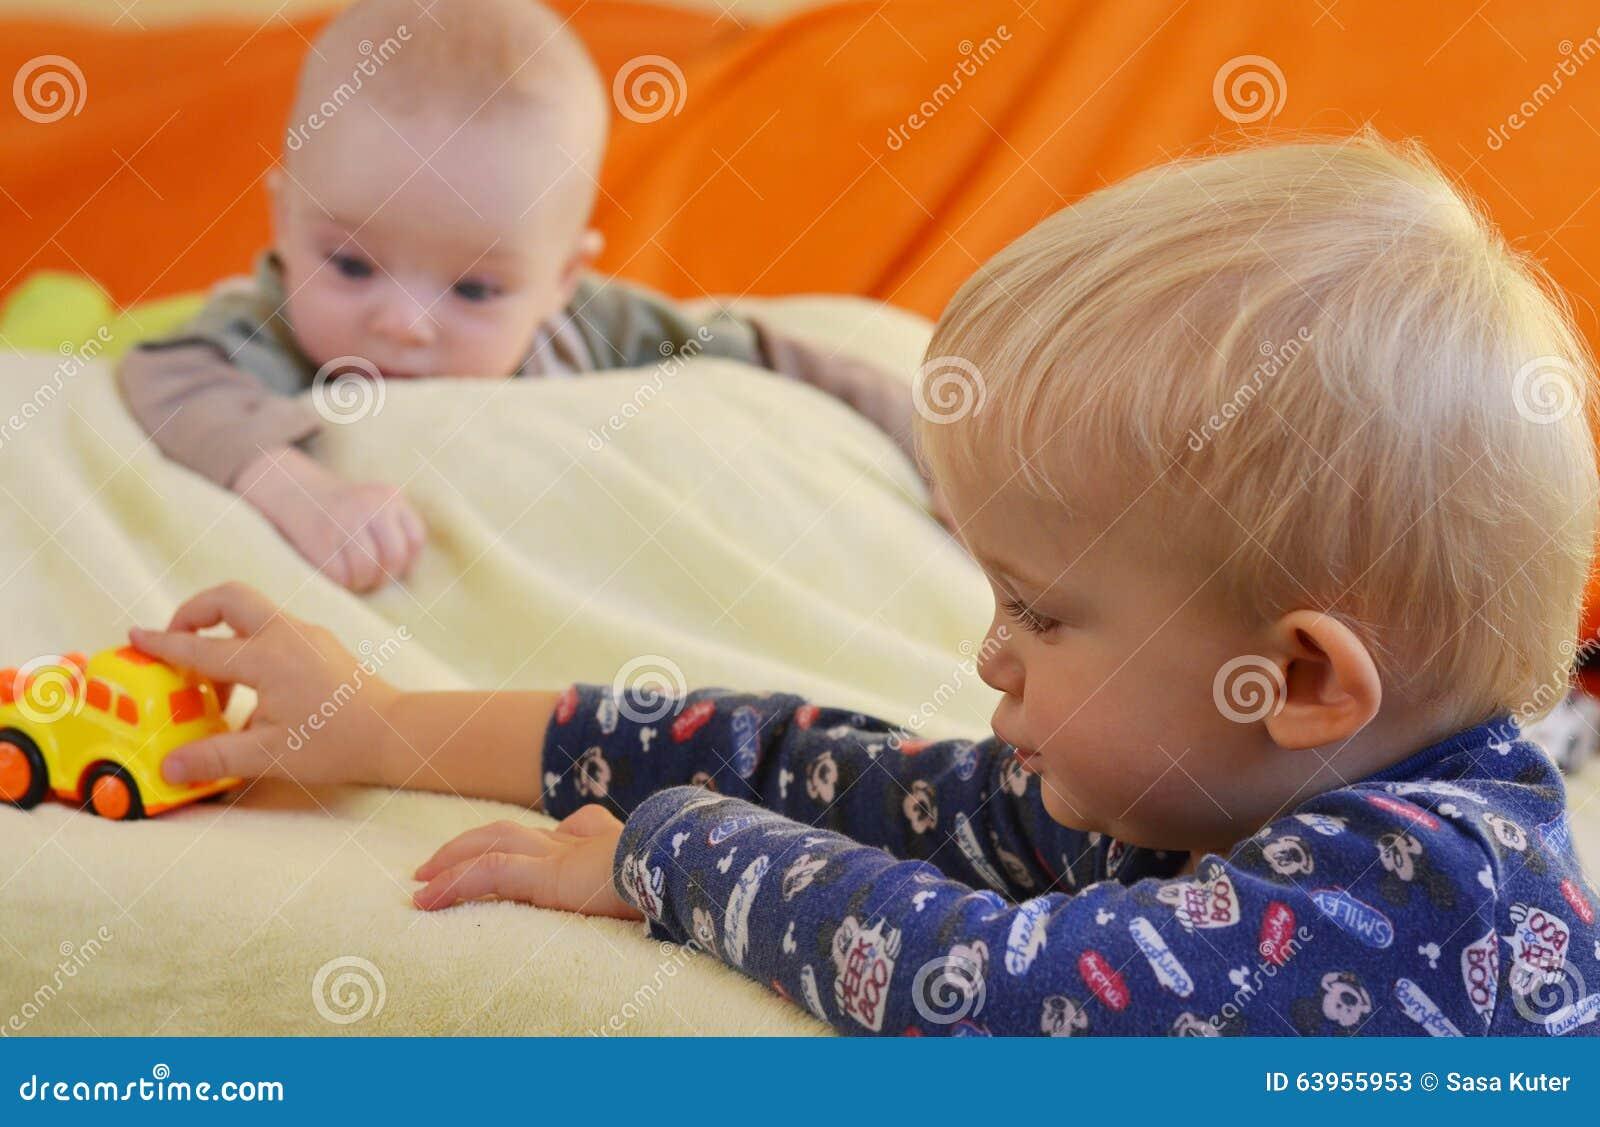 Toys For Siblings : Siblings enjoy of toys baby is watching older brother